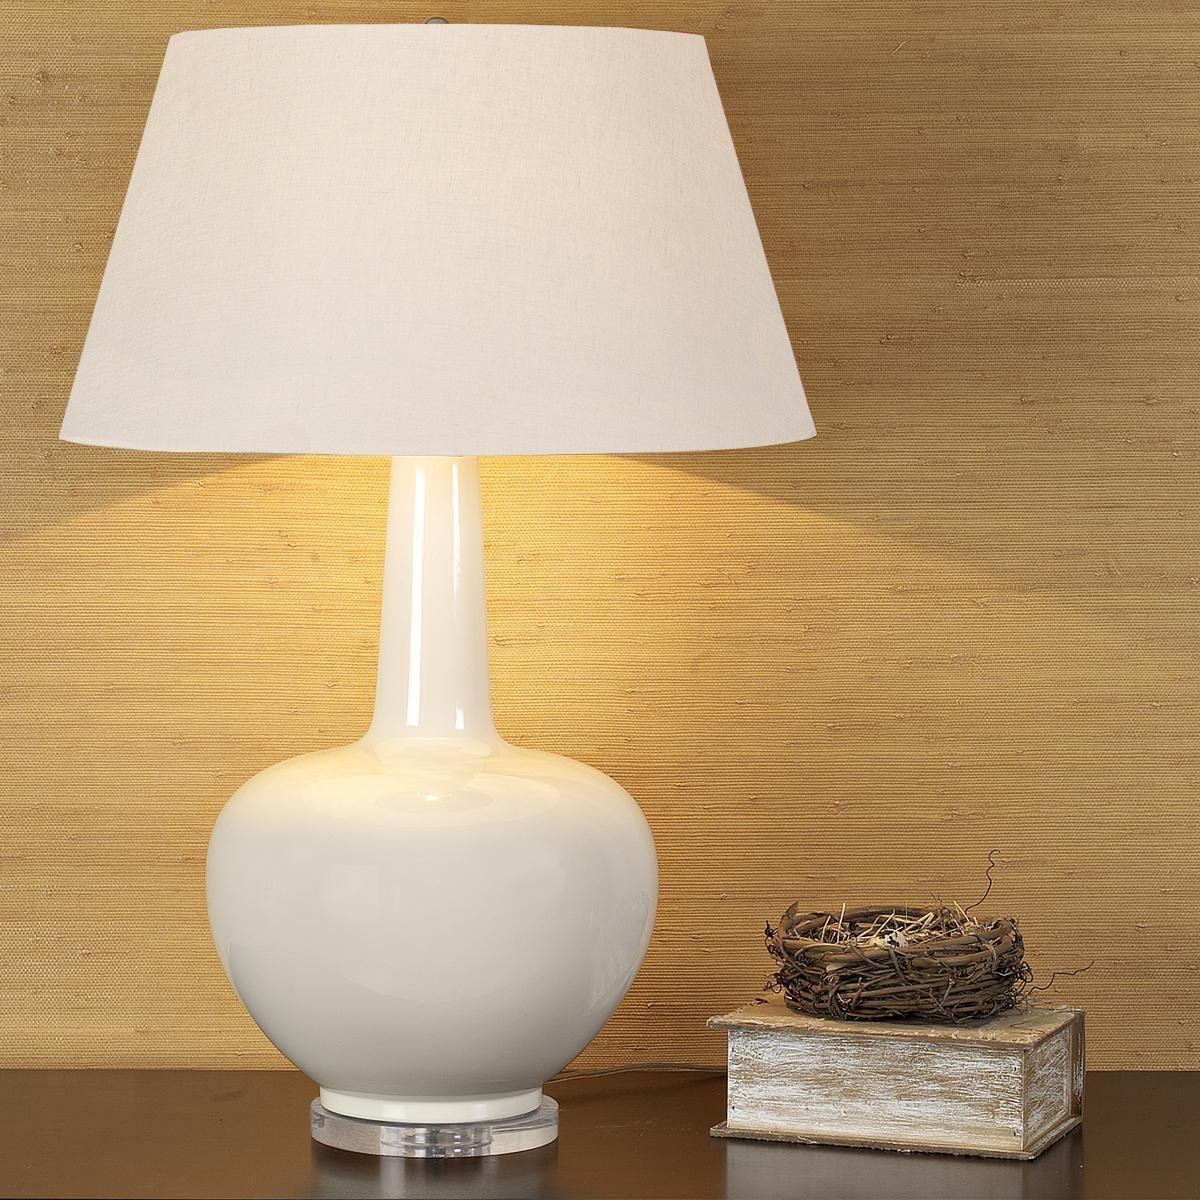 Bottleneck Ceramic Table Lamp - 3 Colors